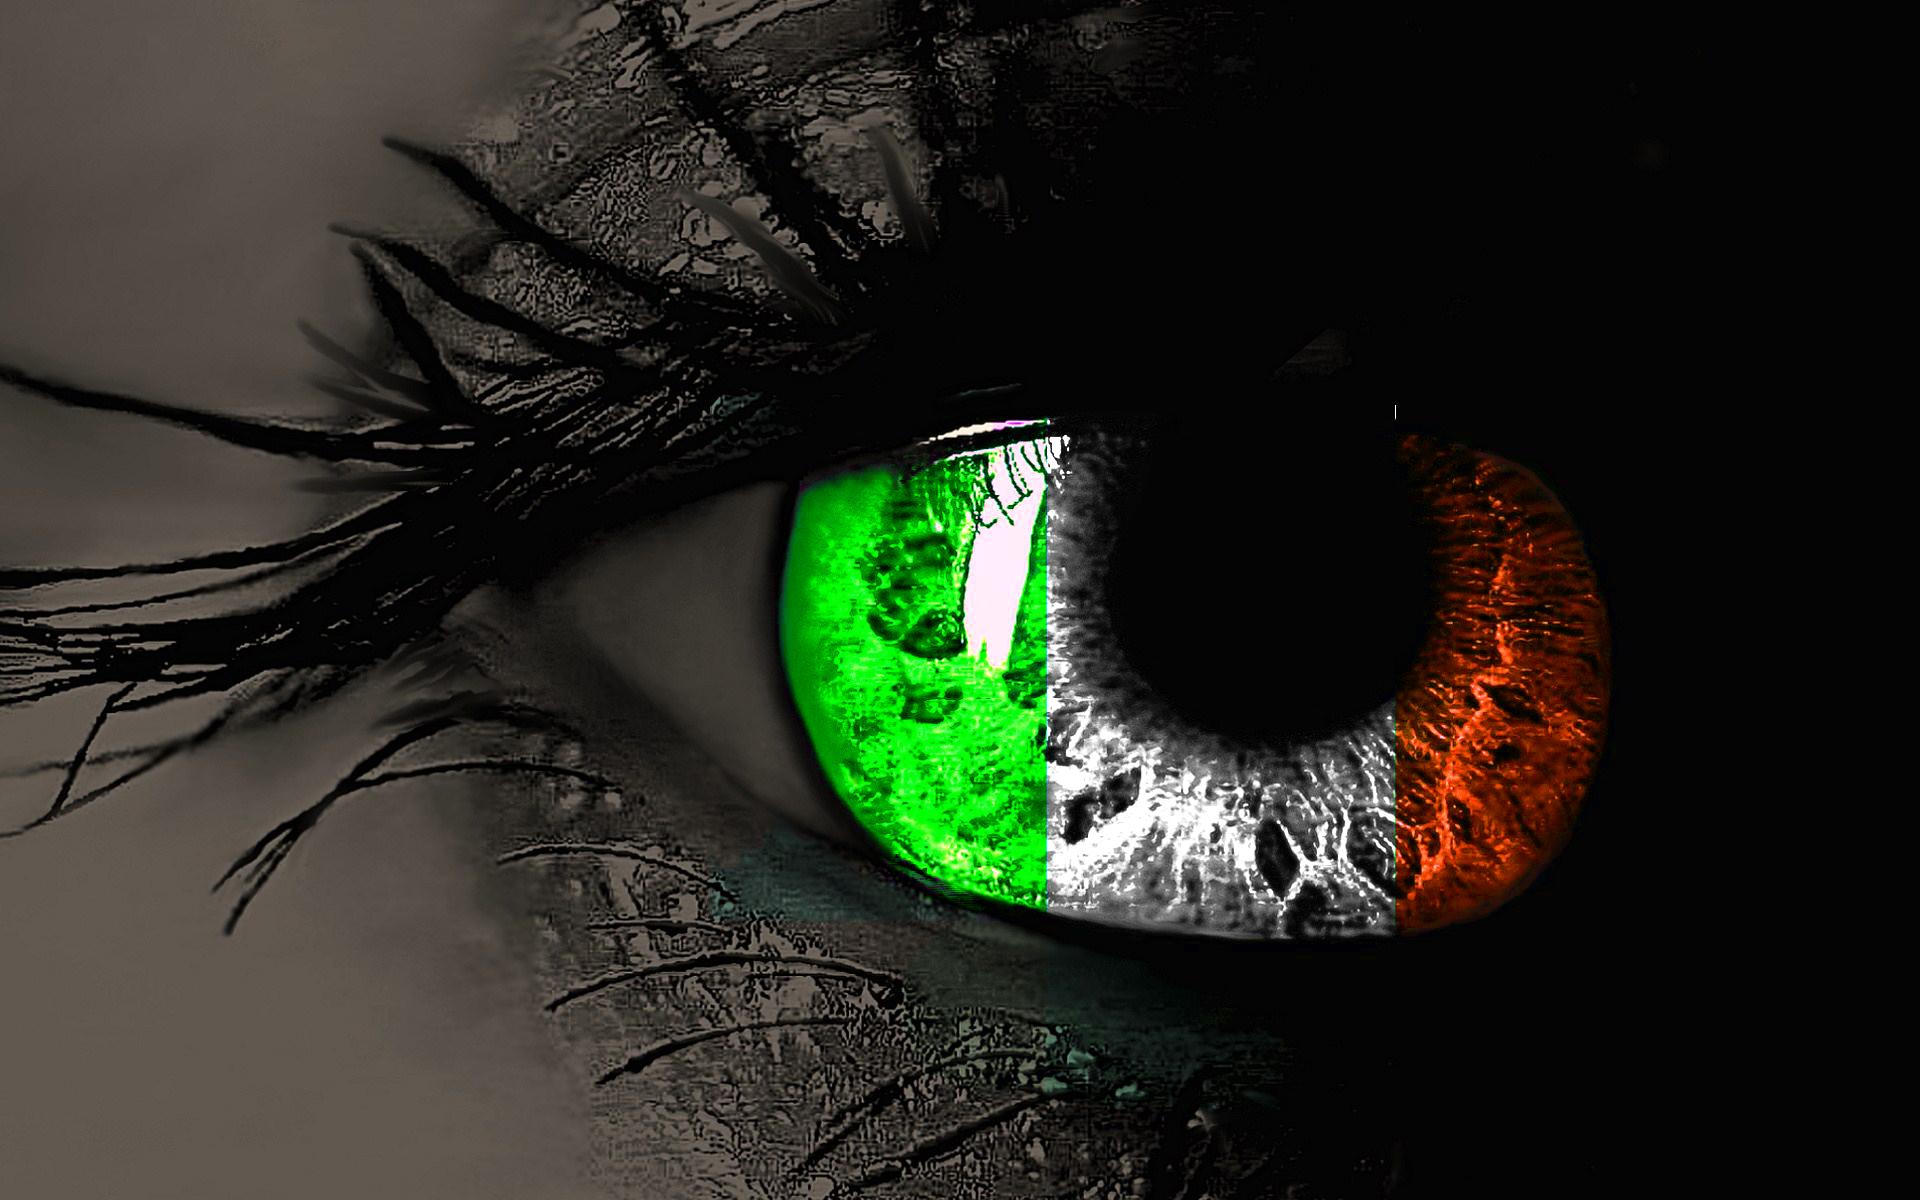 Website Irish Flag In The Eye Hd For Free 867123